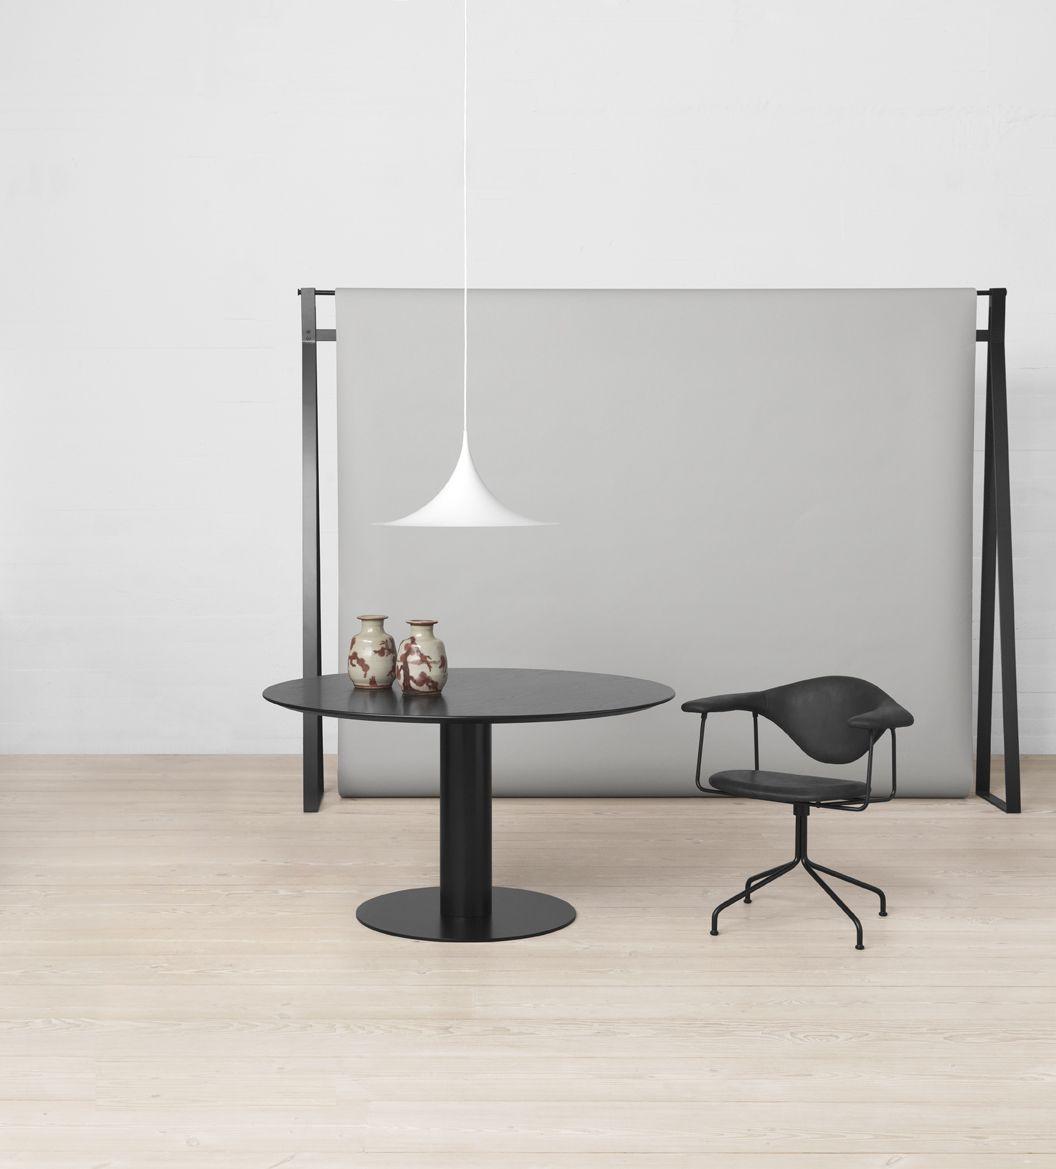 GUBI - Gubi Table 2.0, Masculo Swivel Chair and Semi Pendant